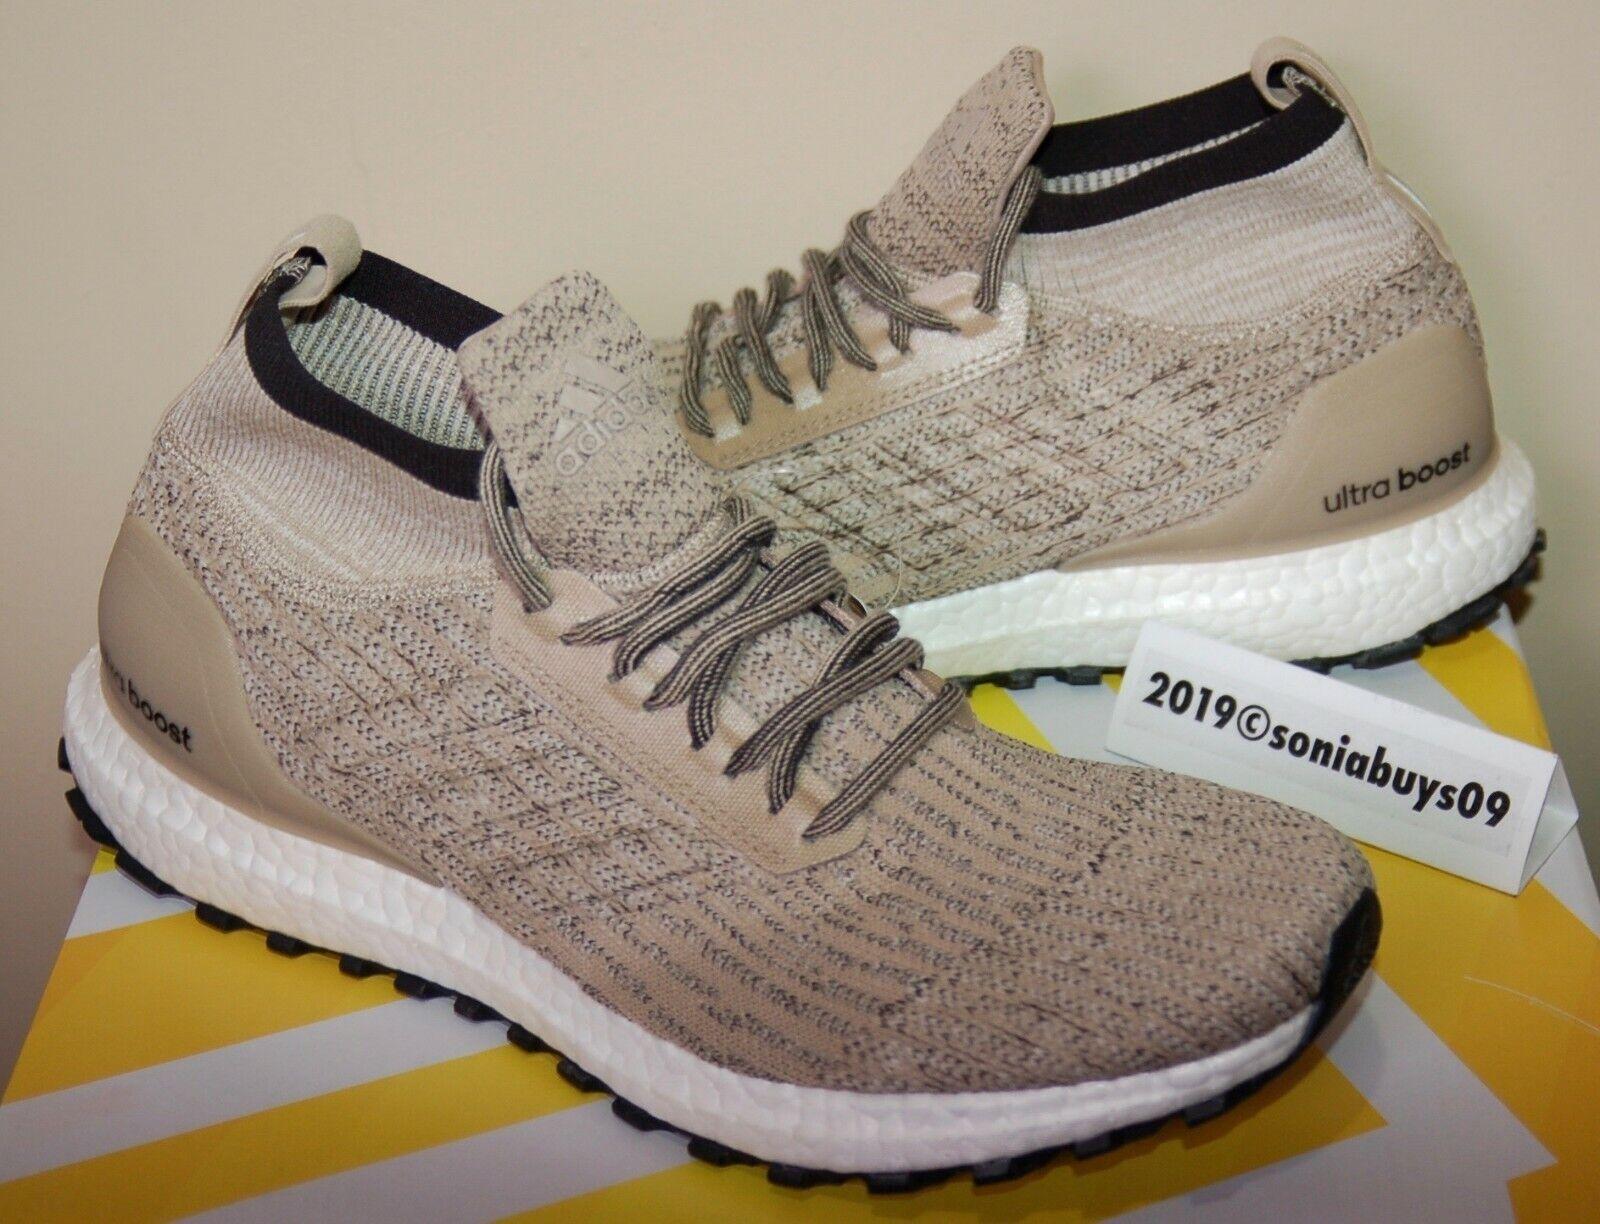 reputable site 9f29a 7a3ec Adidas Men s Ultra Boost Terrain LTD shoes, CG3001, Khaki, Size 9.5 Running  All ofdyhc9008-Men